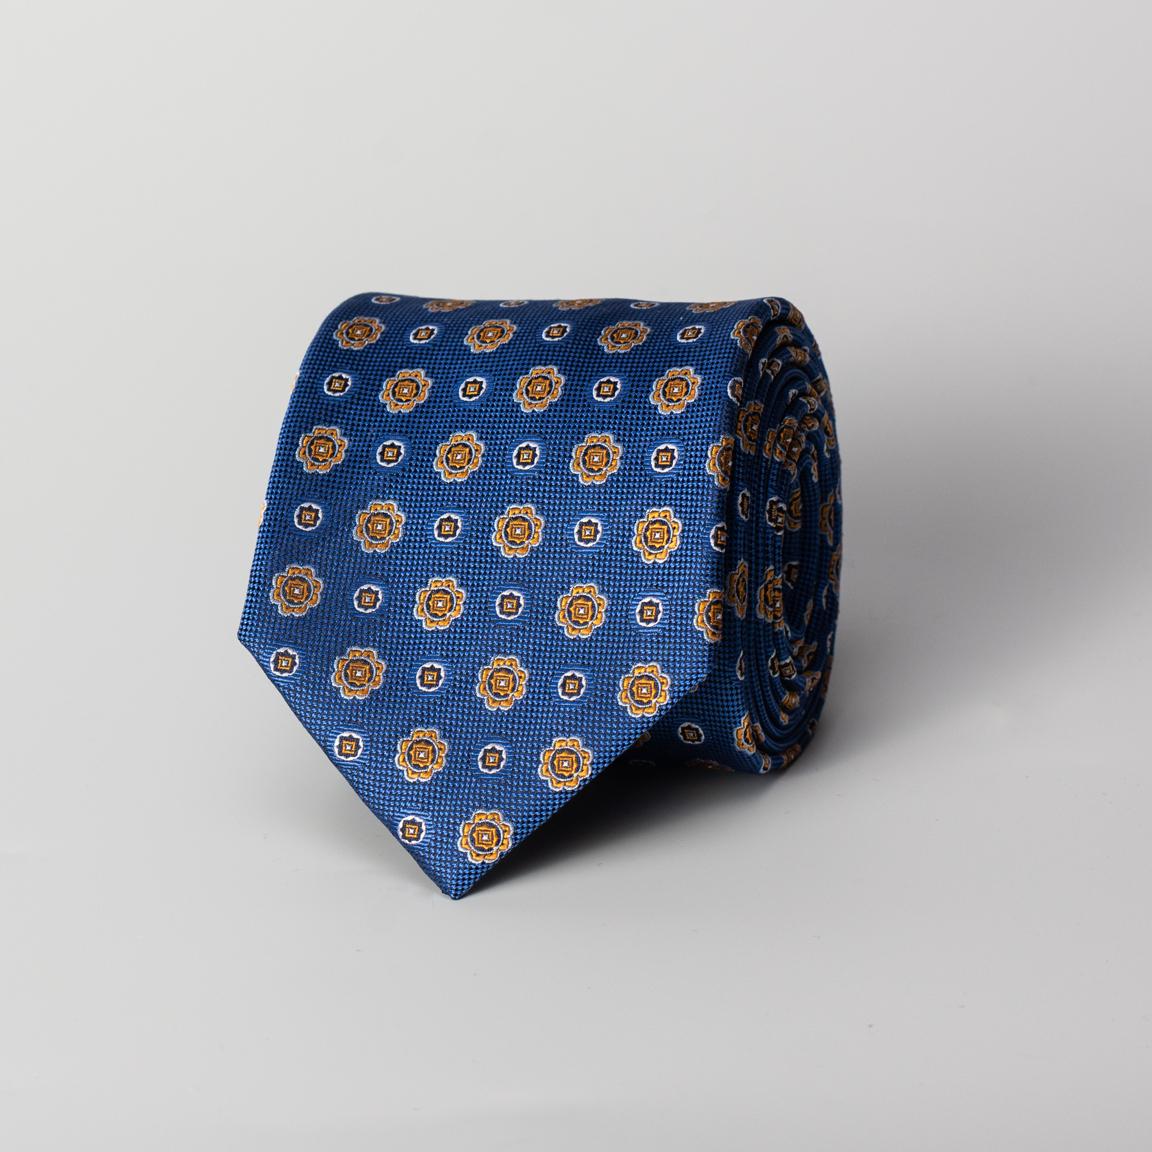 Cravate en soie en bleu fleuri